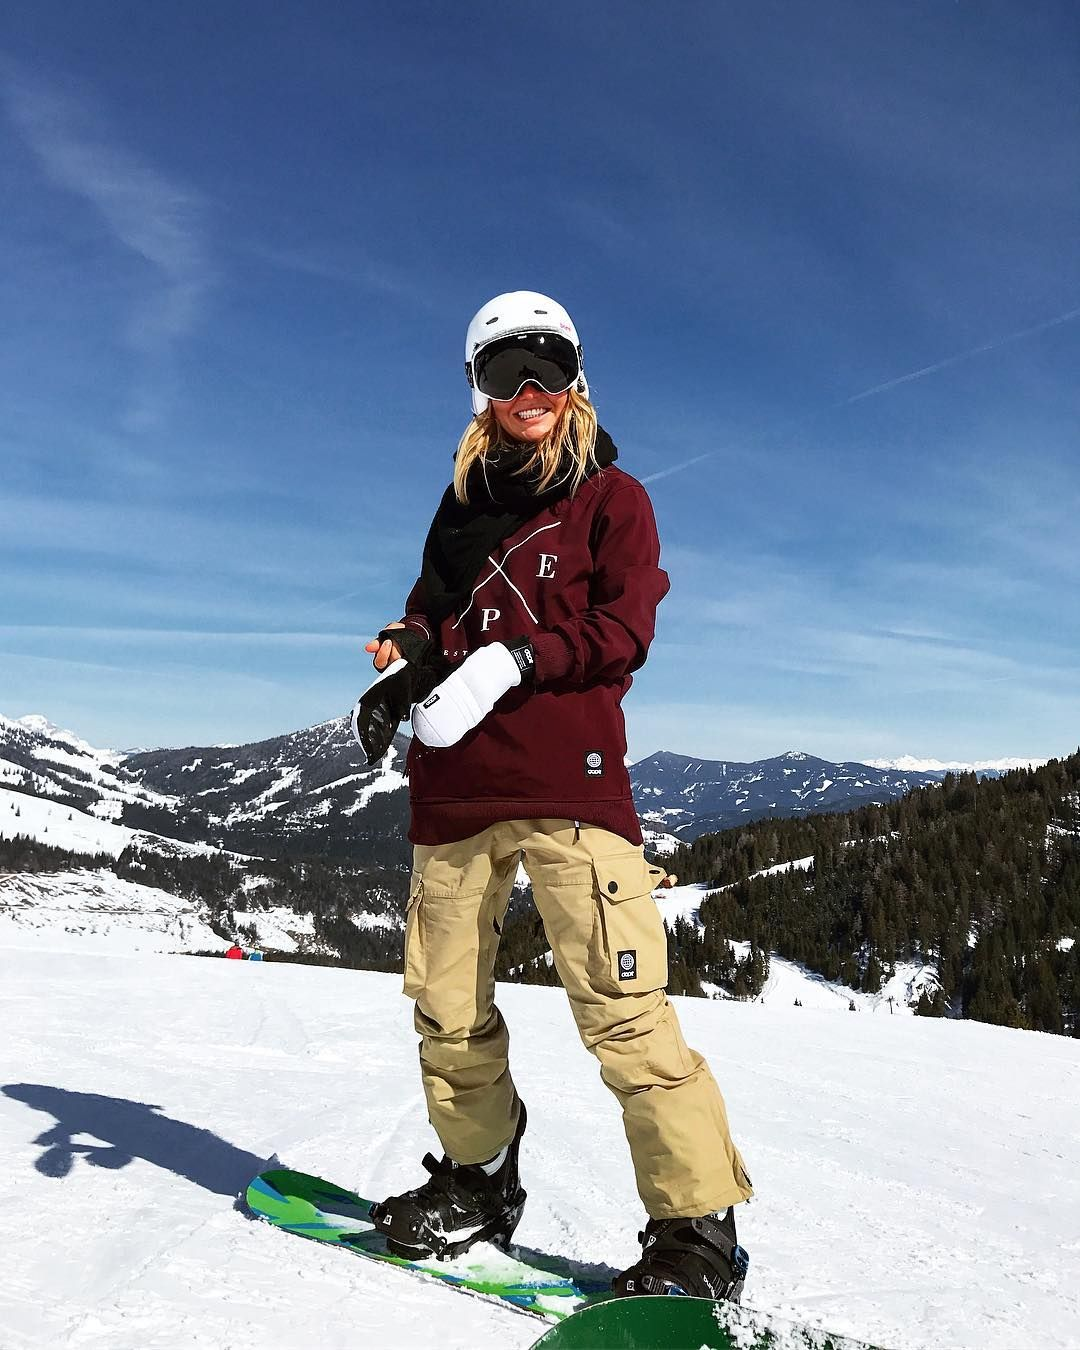 snowboarding gear womens SnowLife Snowboarding style